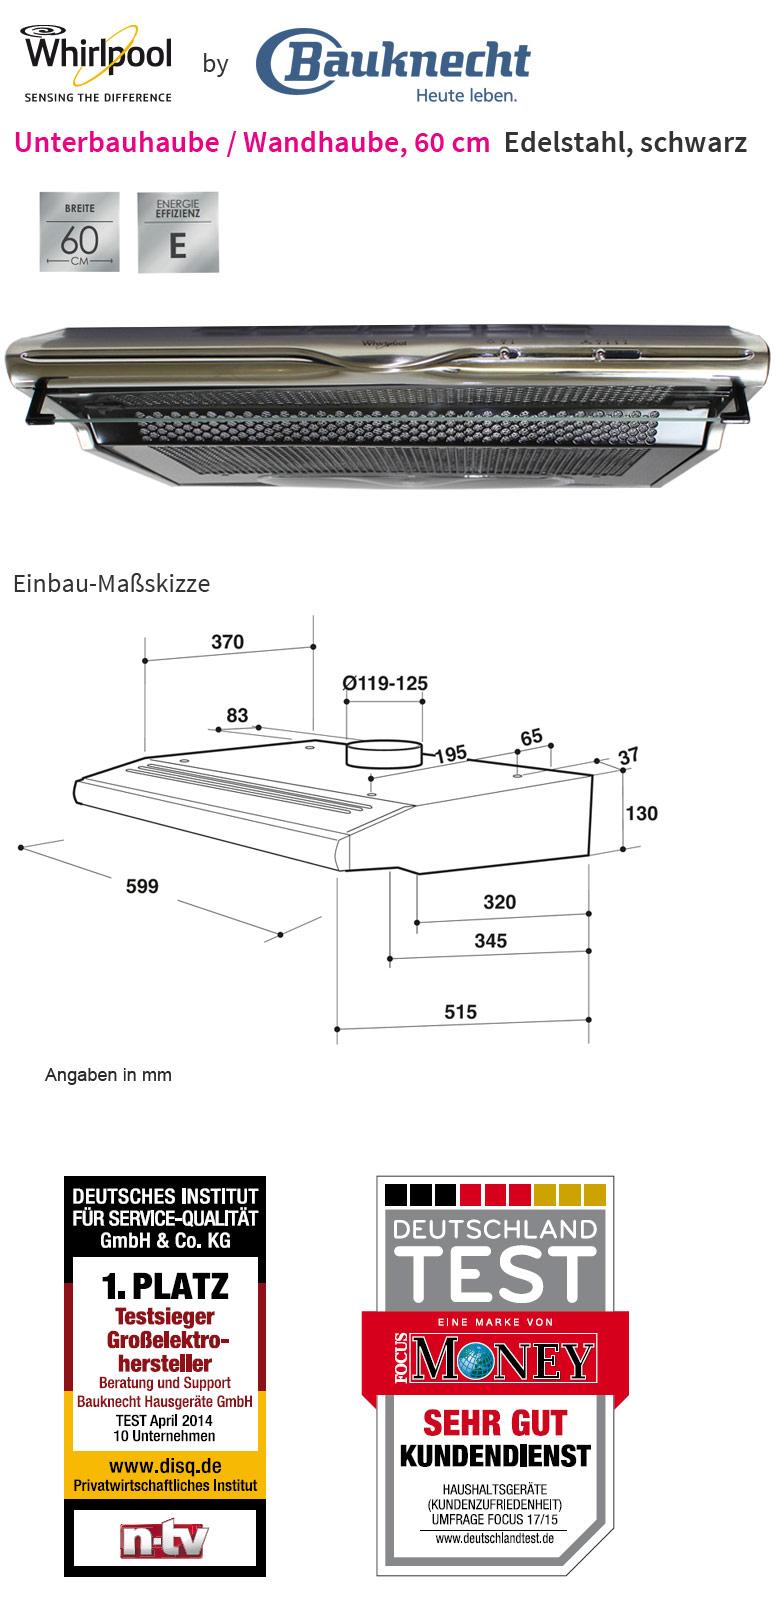 whirlpool akr 420 1 ix edelstahl 60 cm unterbau dunstabzugshaube unterbauhaube ebay. Black Bedroom Furniture Sets. Home Design Ideas